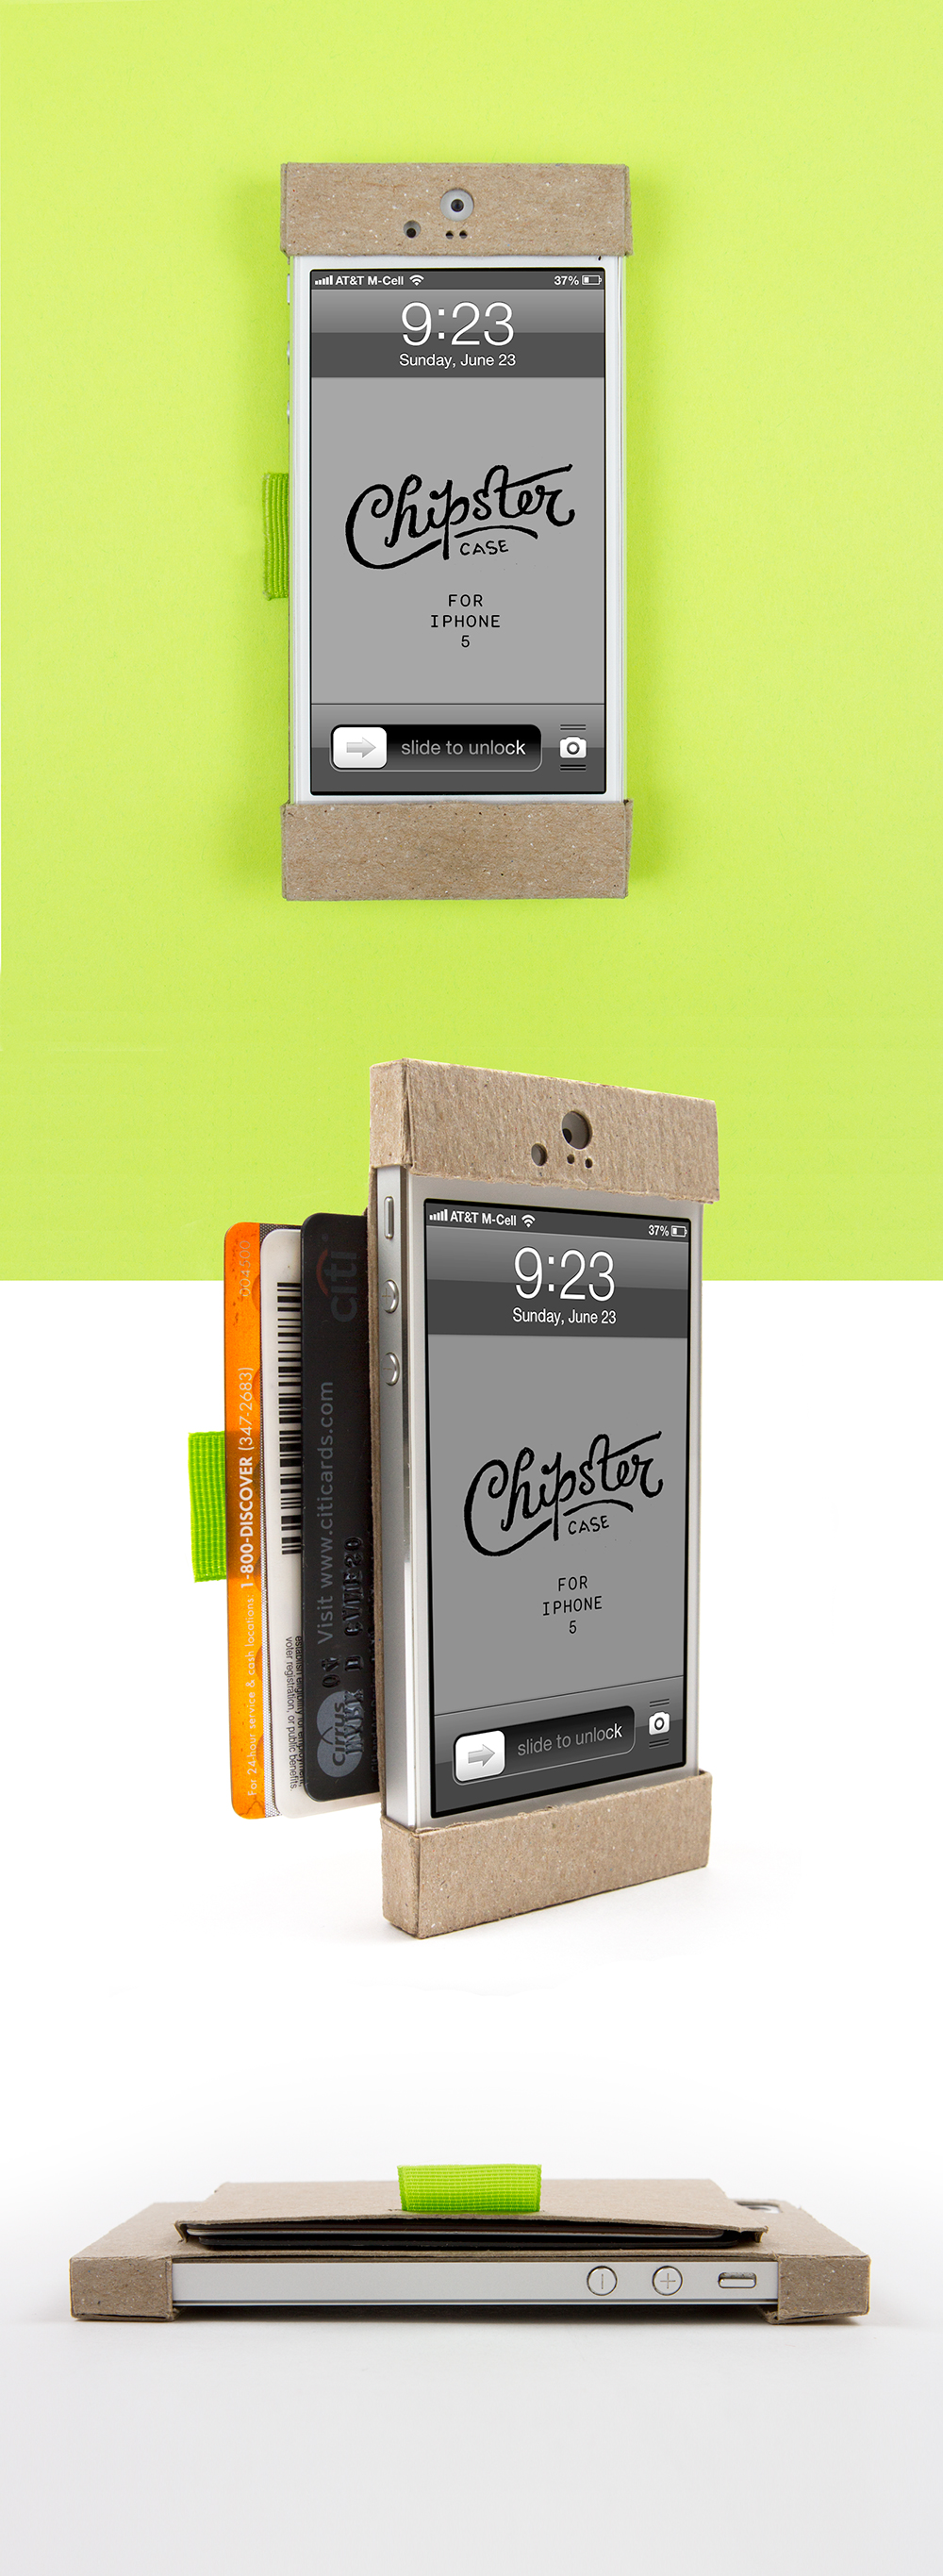 Chipster_Image.jpg